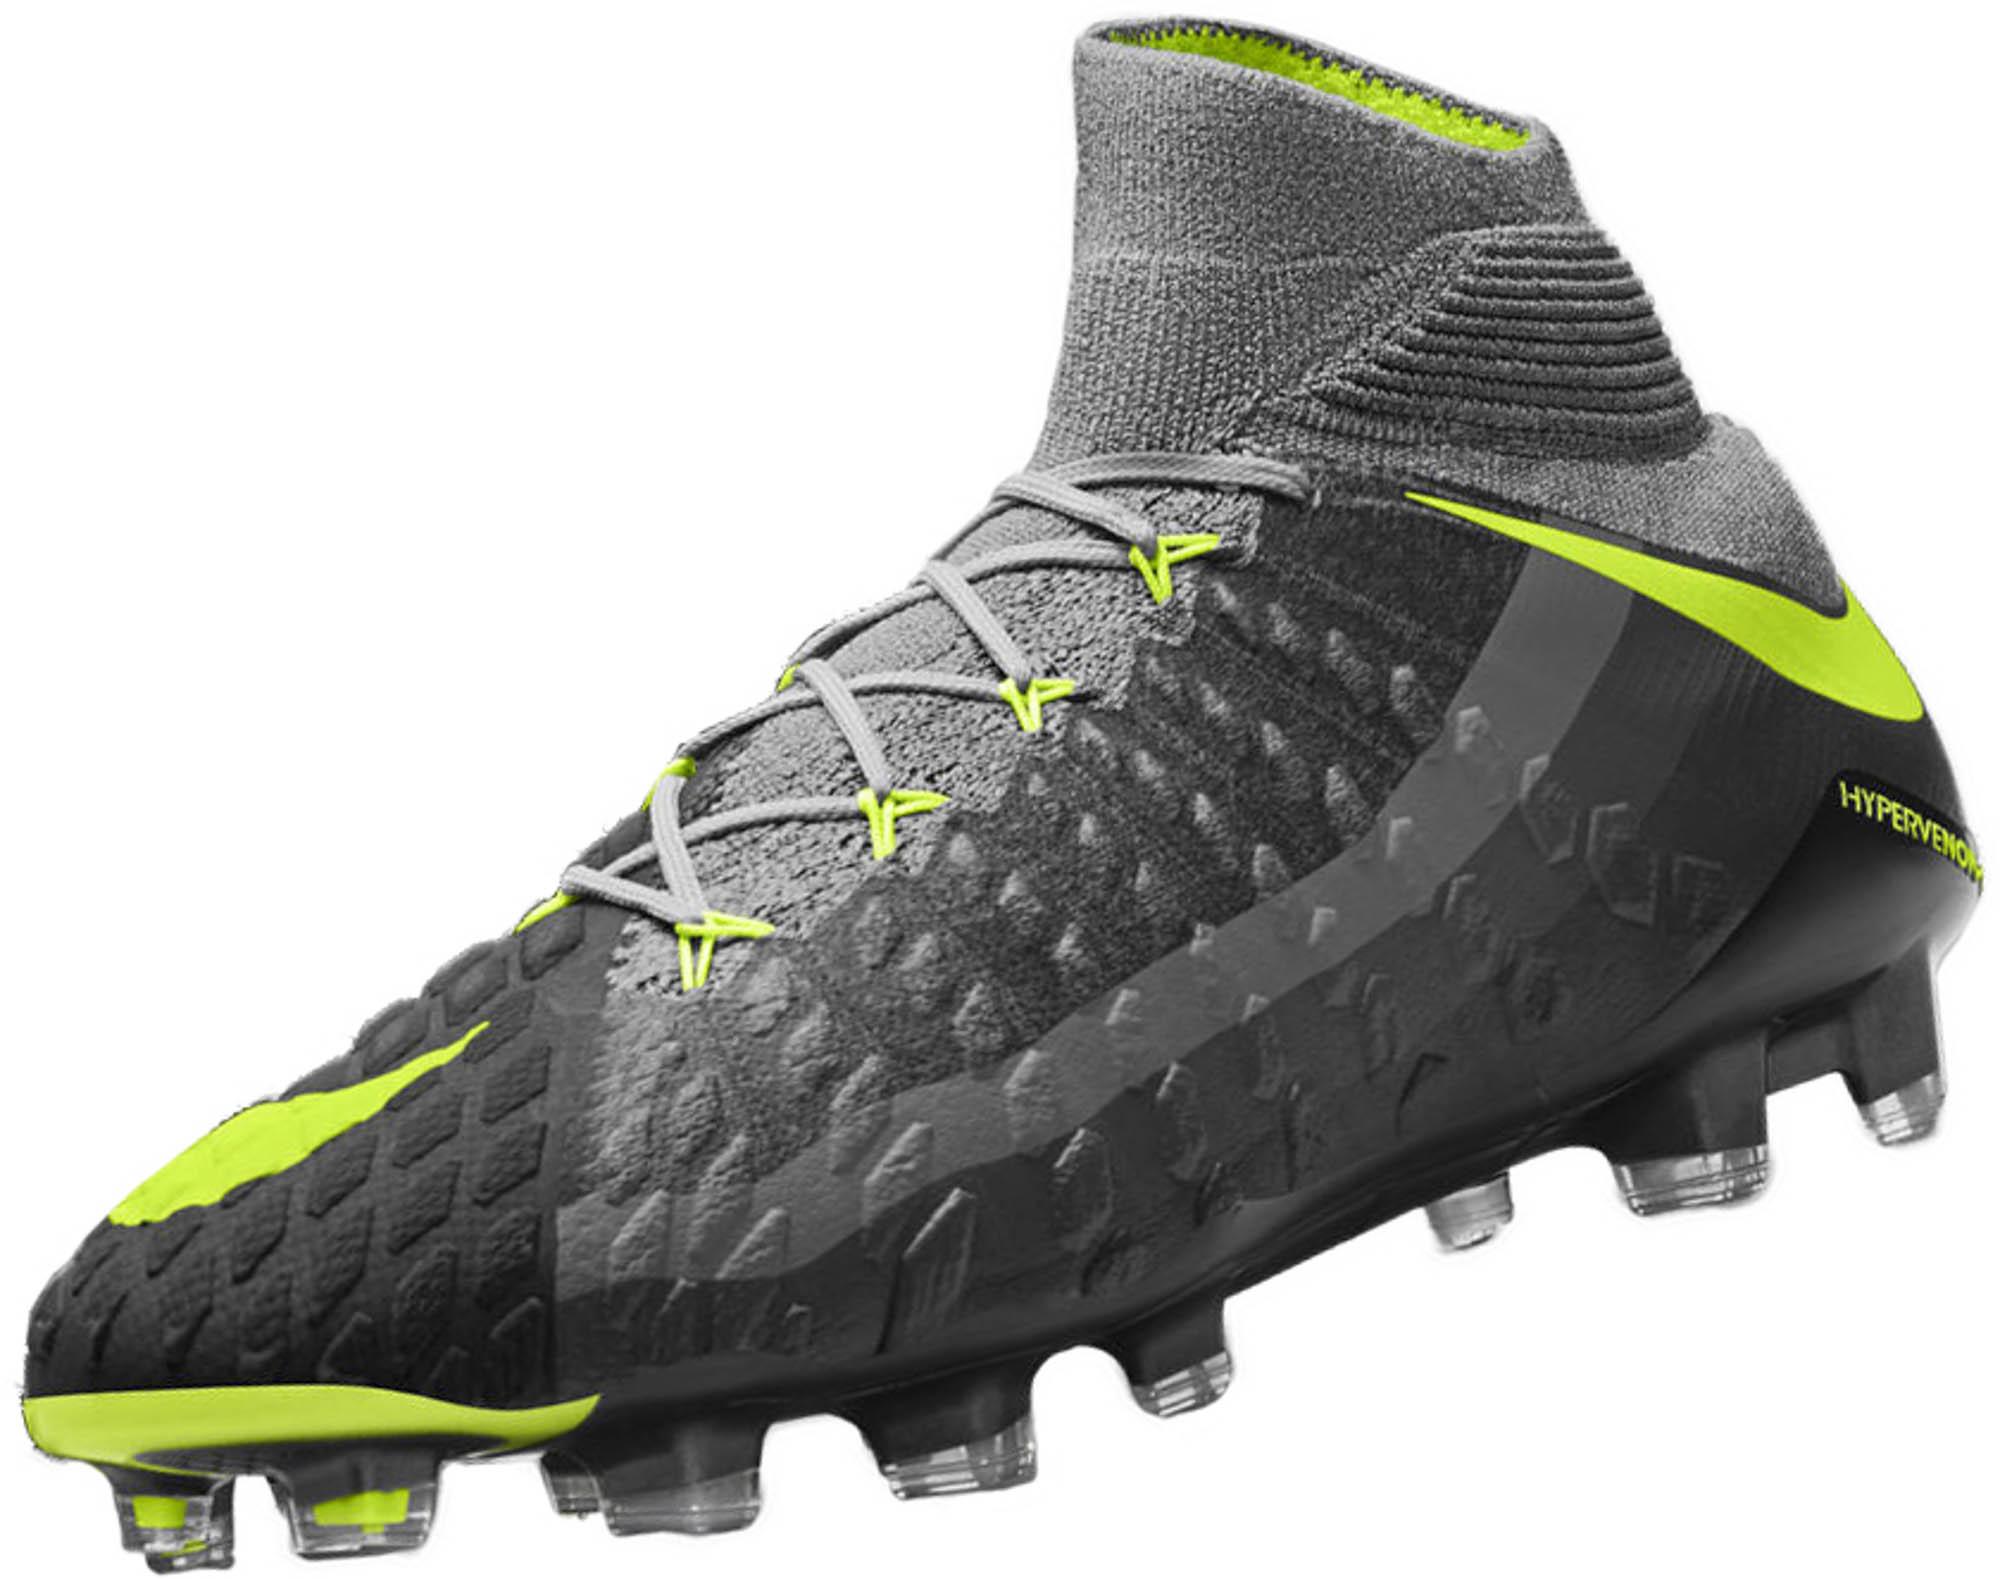 c2edd346684 Nike Hypervenom Phantom III DF FG Soccer Cleats – SE – Wolf Grey   Volt